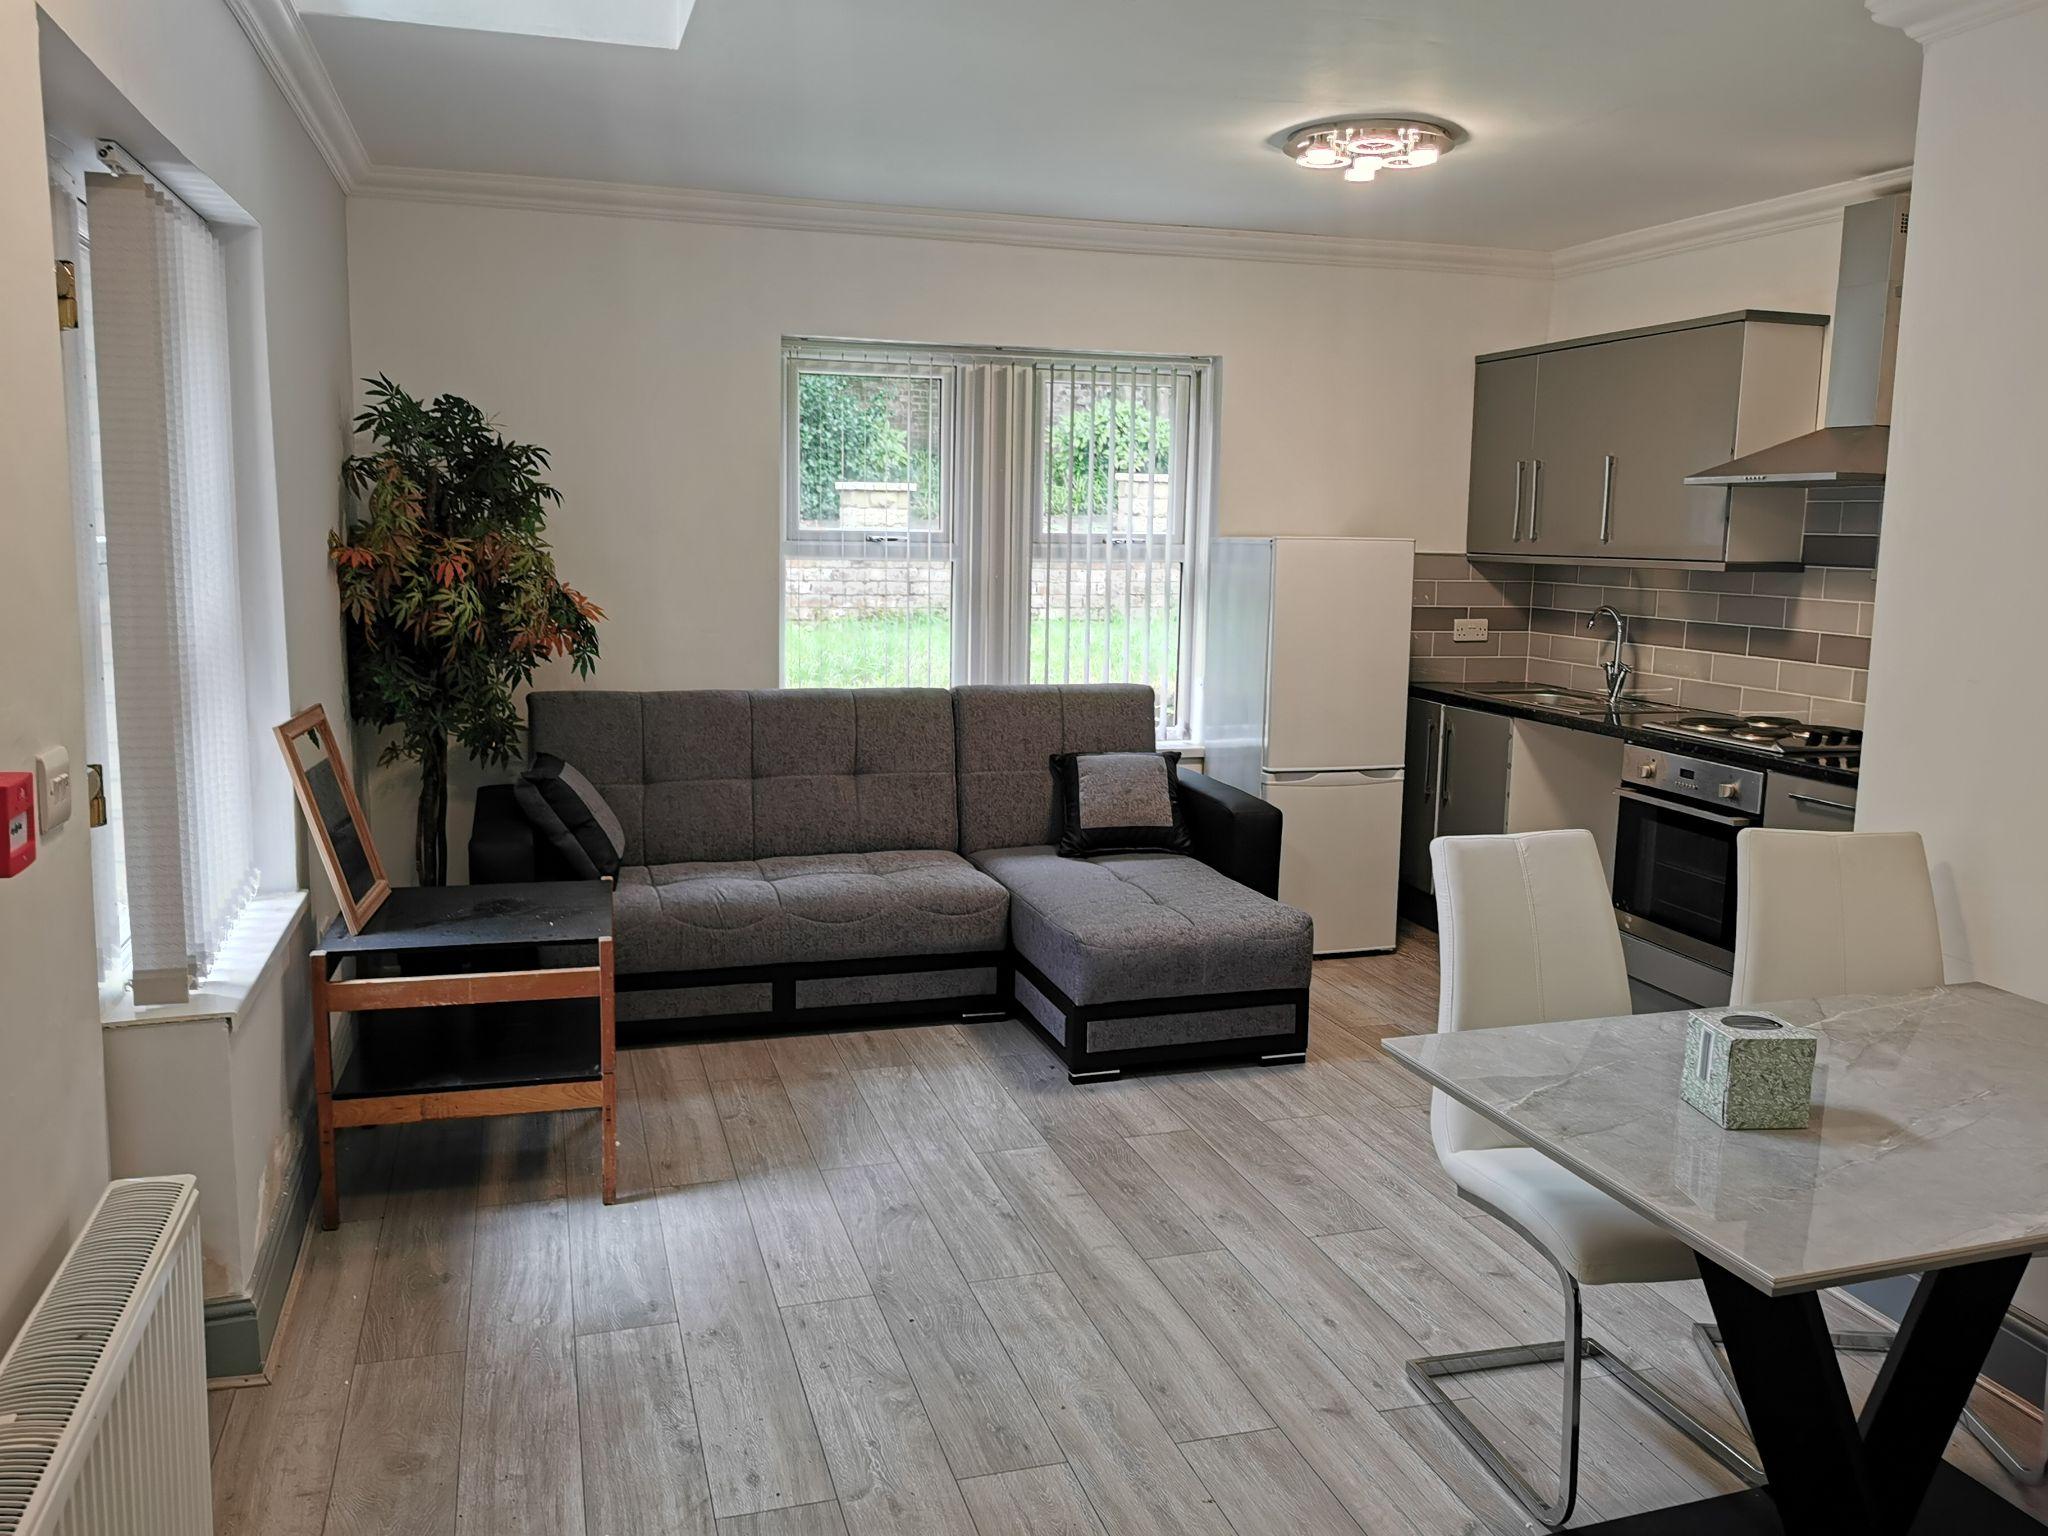 1 bedroom apartment flat/apartment in Bradford - Photograph 1.